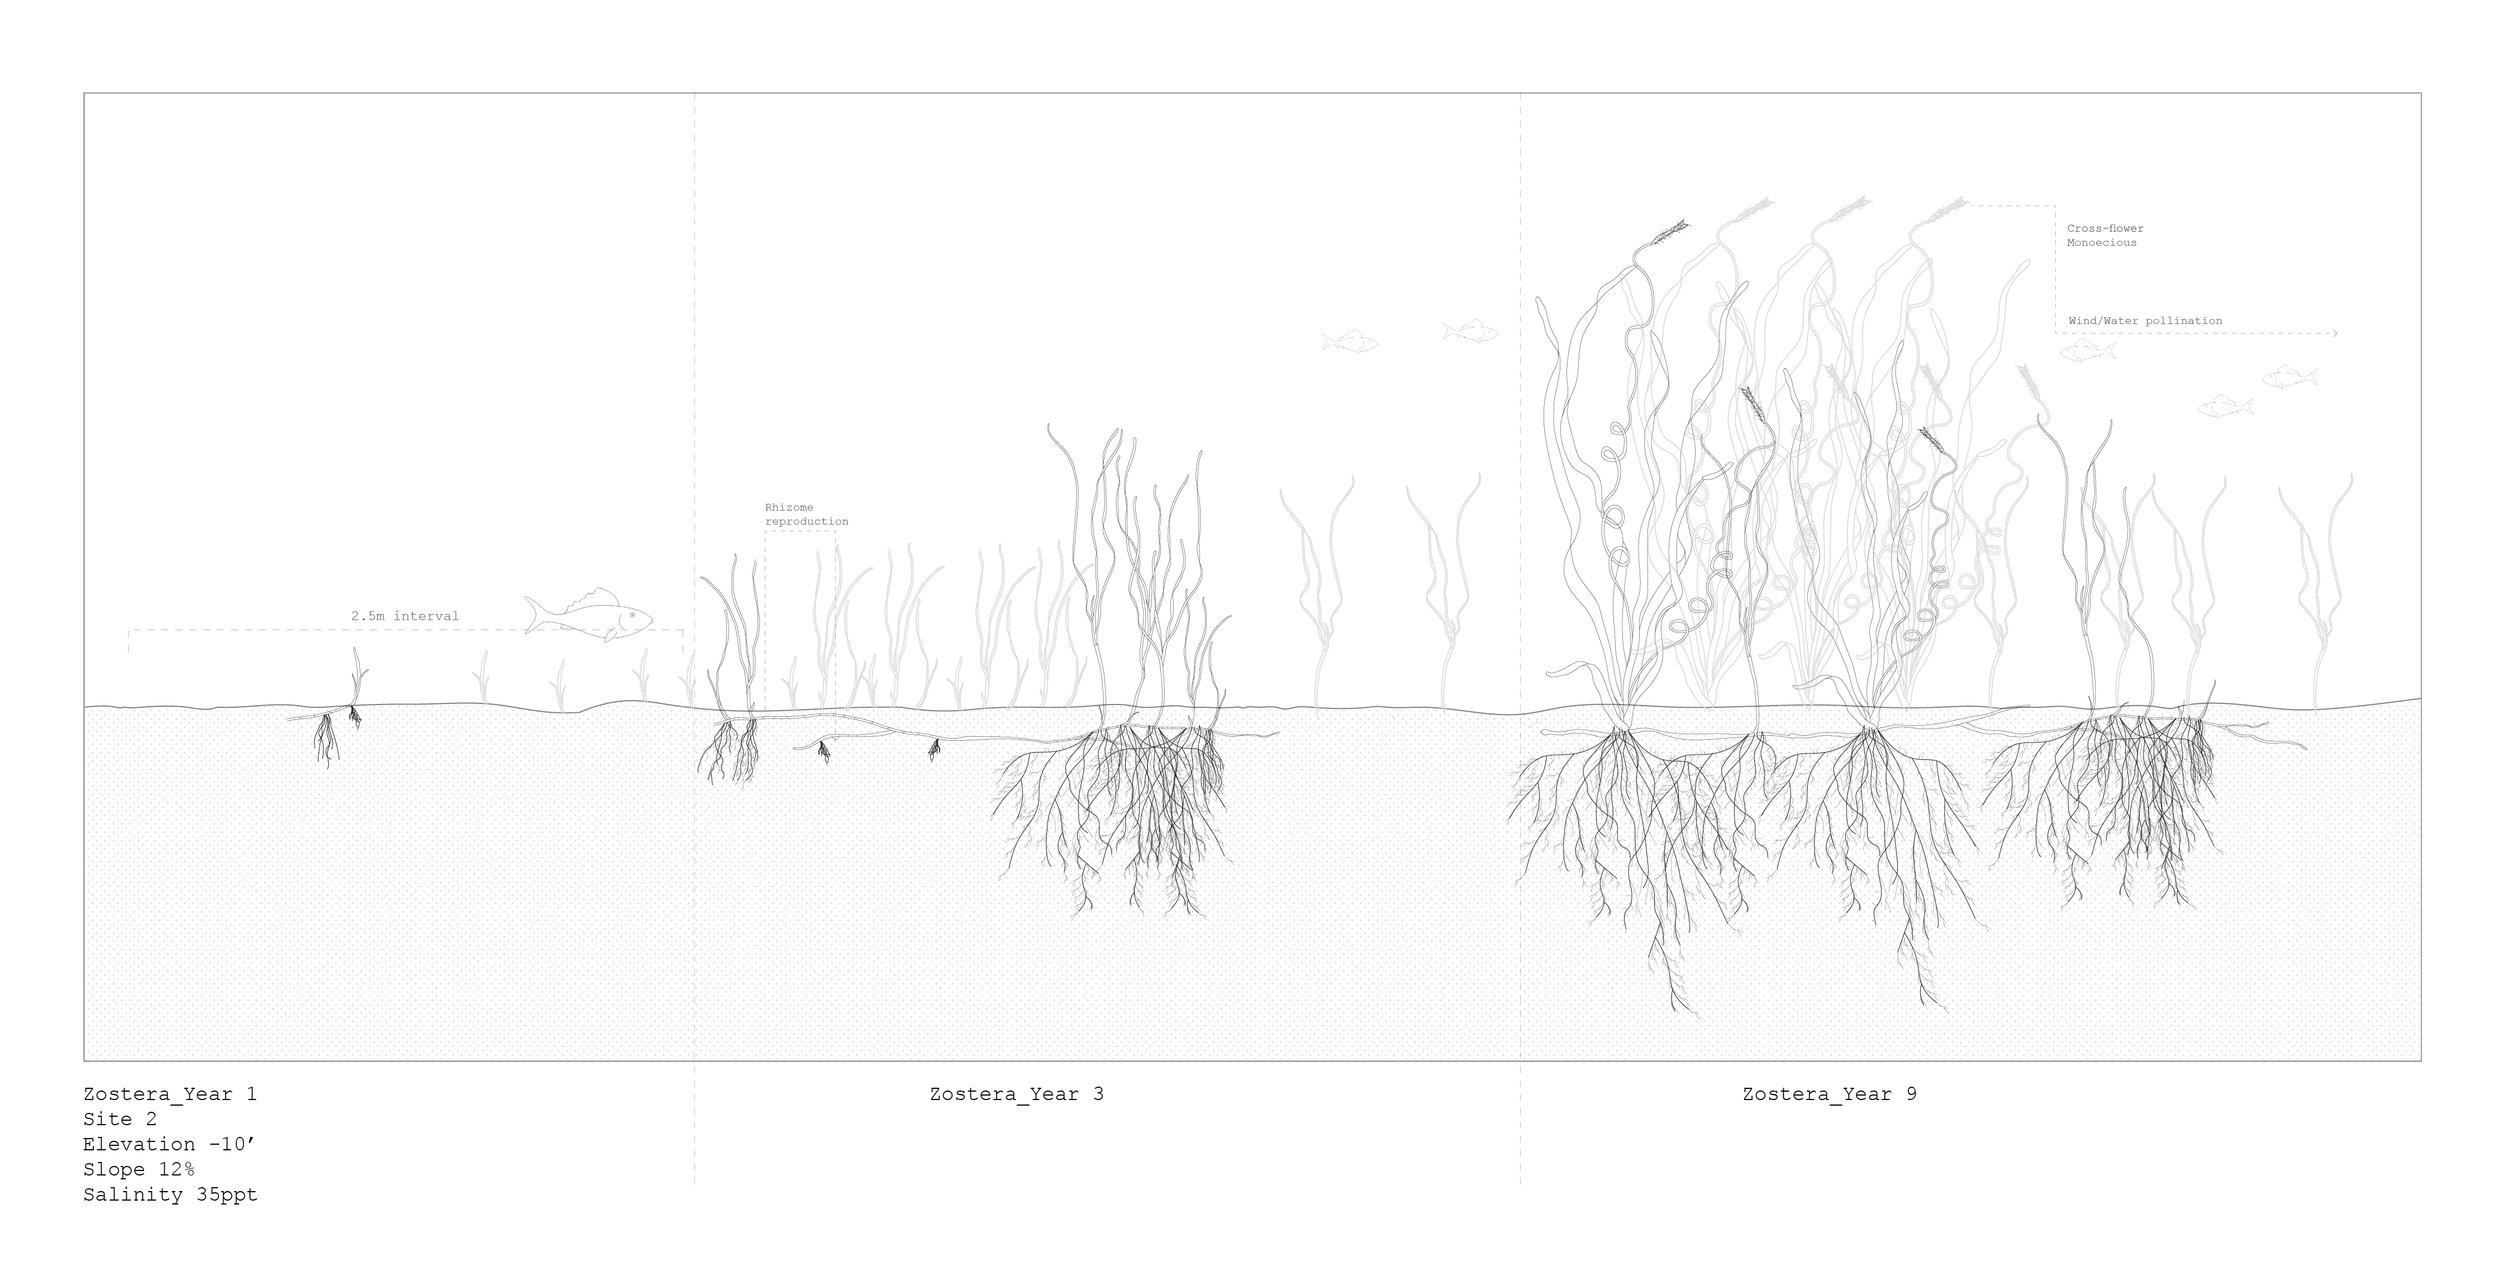 Zostera Marina, Growth Analysis